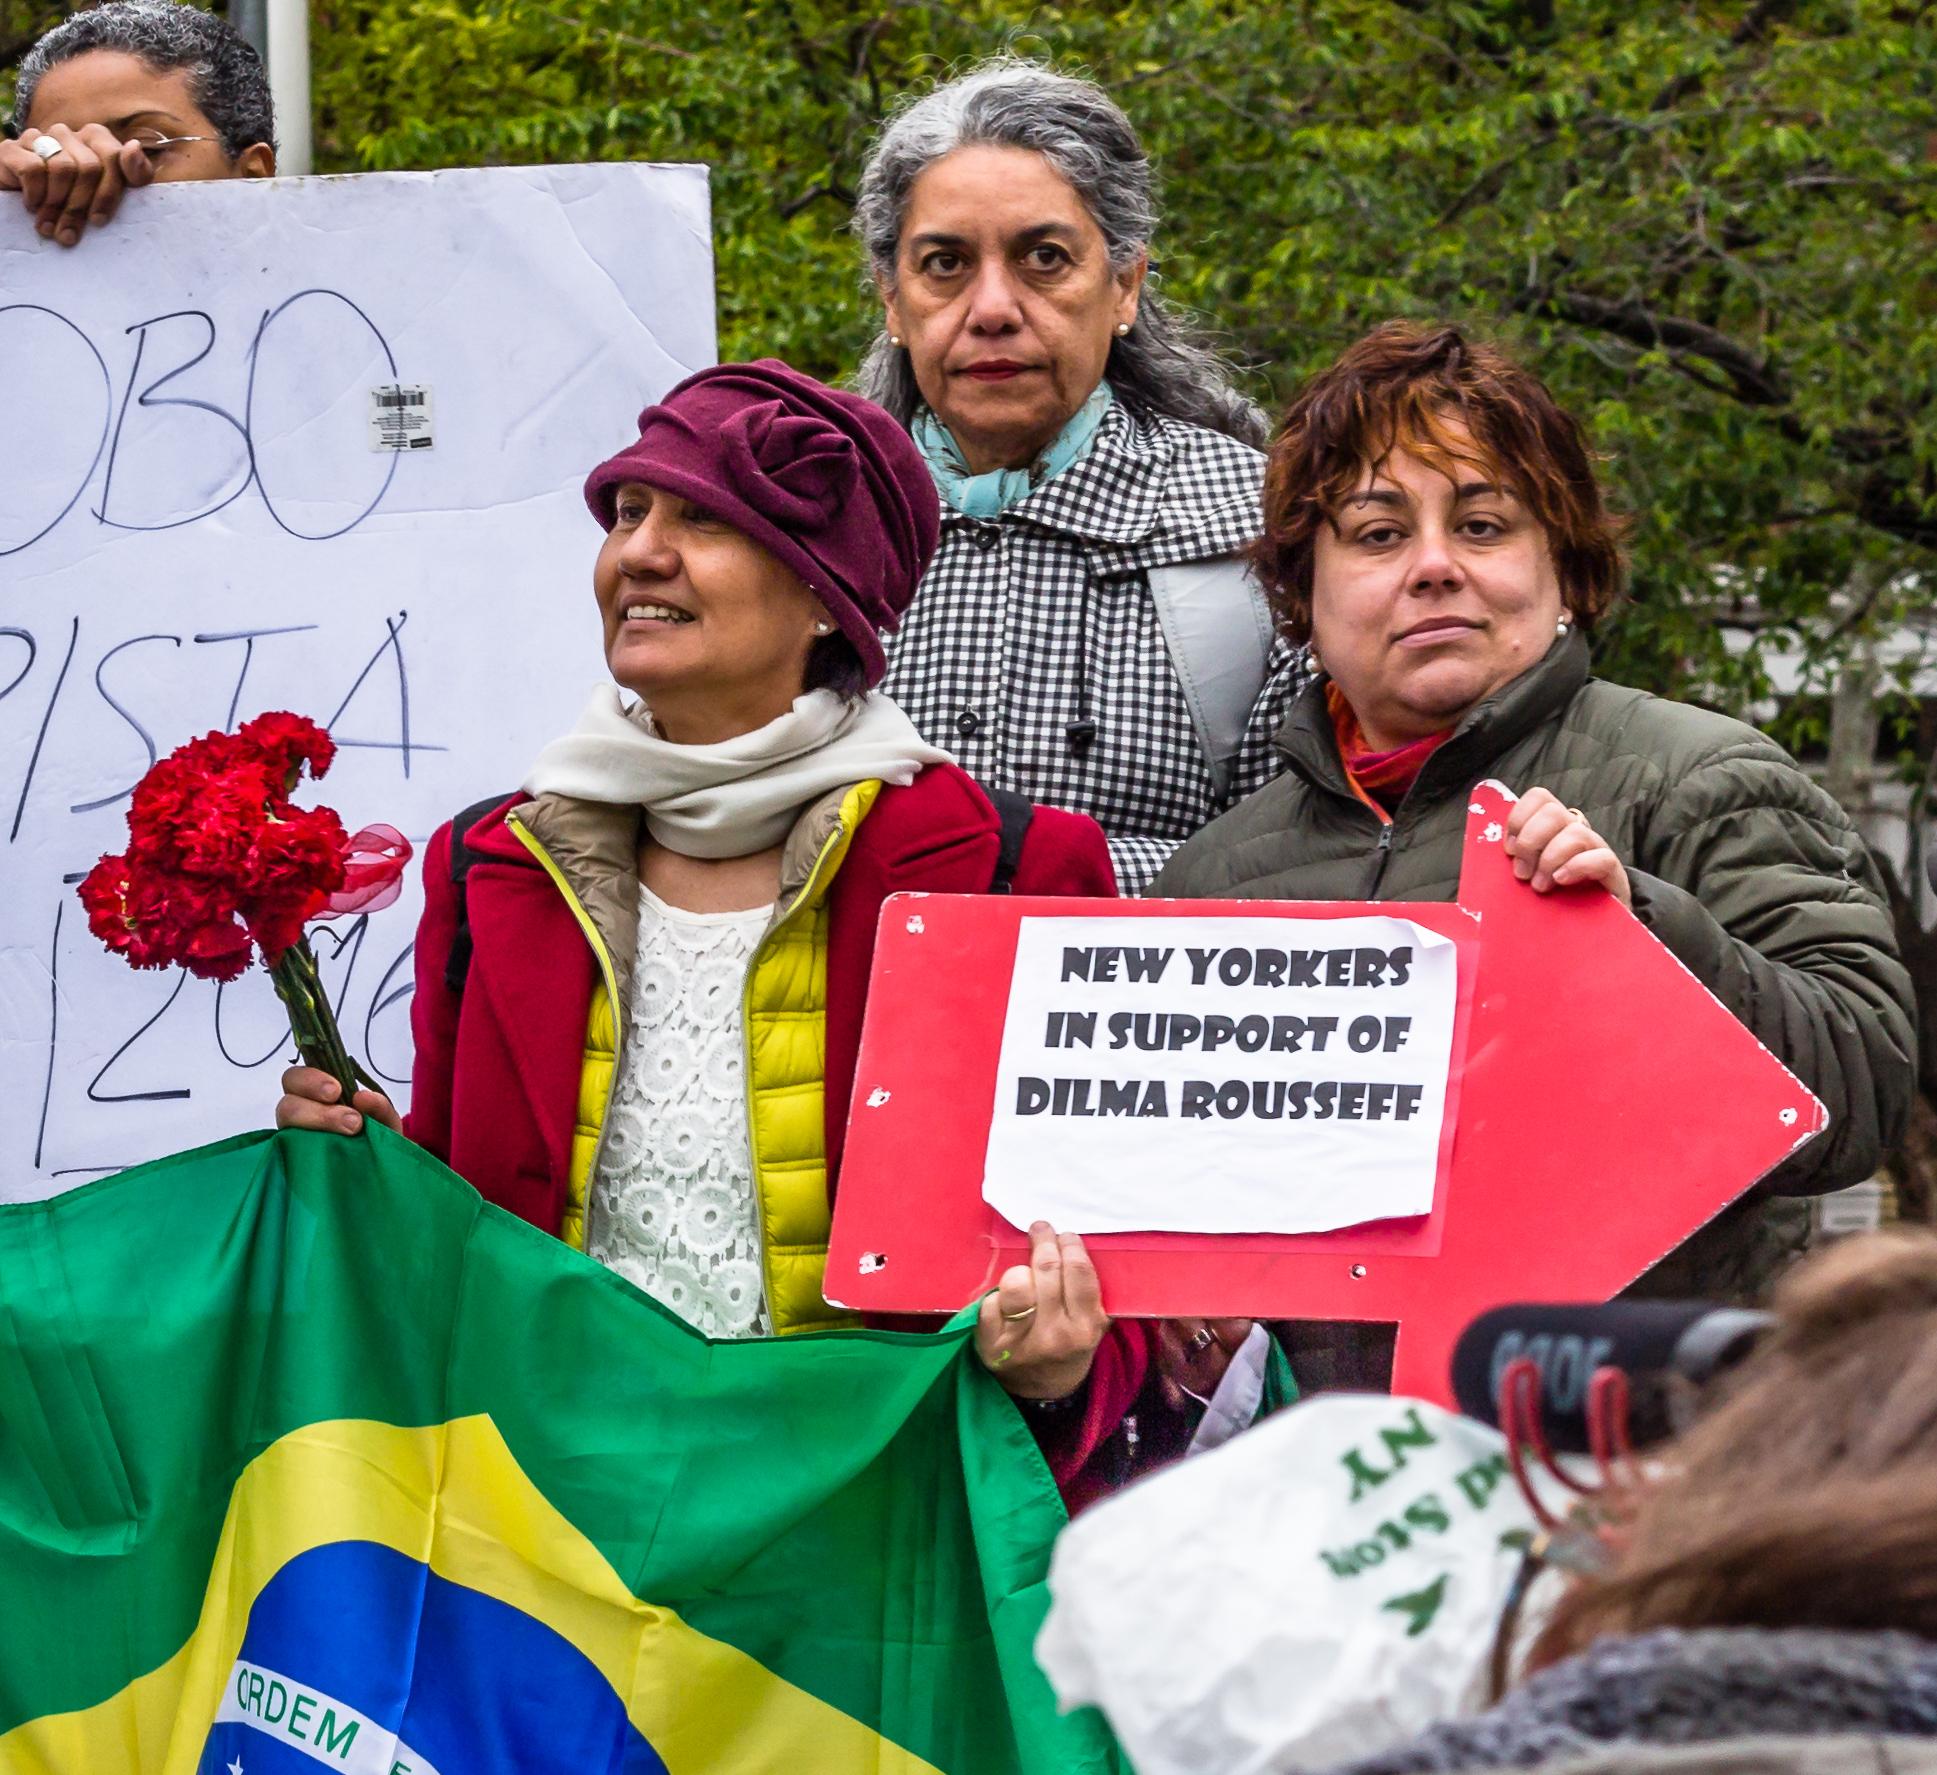 NYC2016-MayDay-Brazil-3.jpg